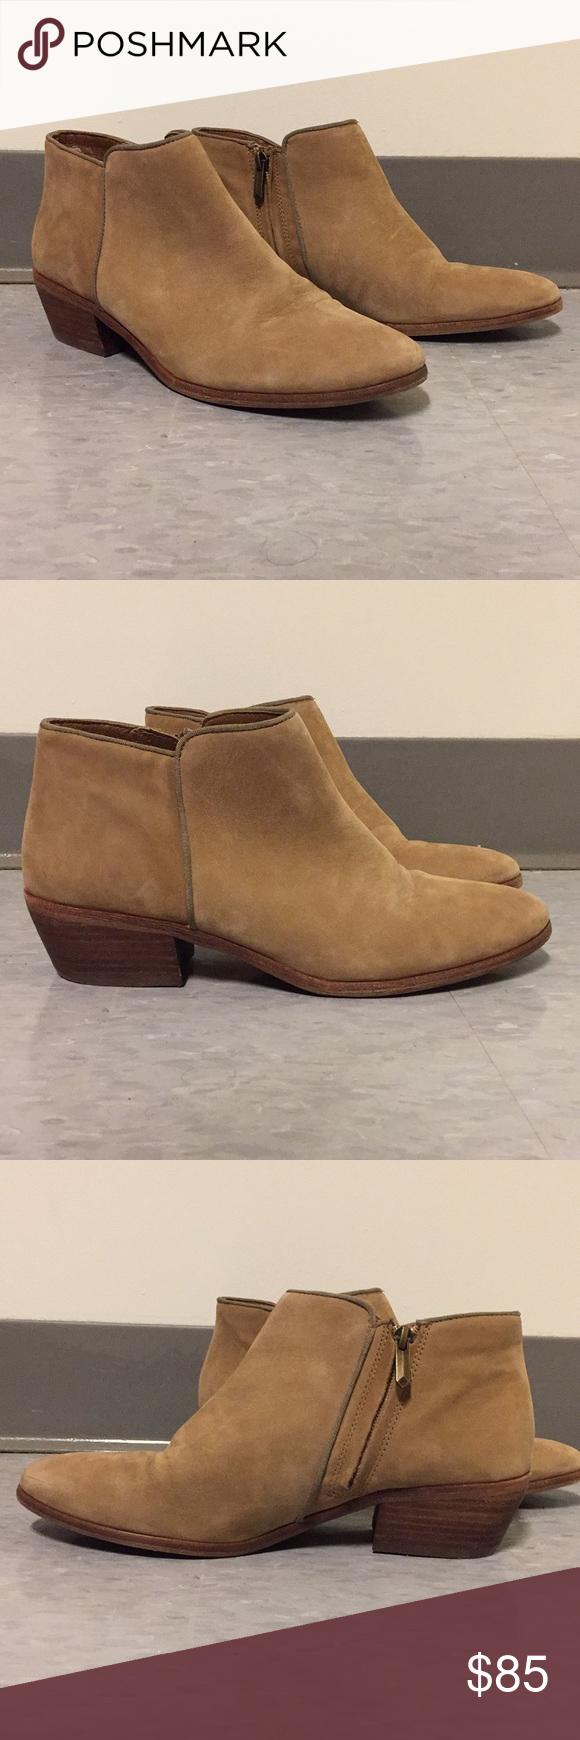 31dd2cfabcb151 Sam Edelman Petty Ankle Boot Honey Nubuck Leather